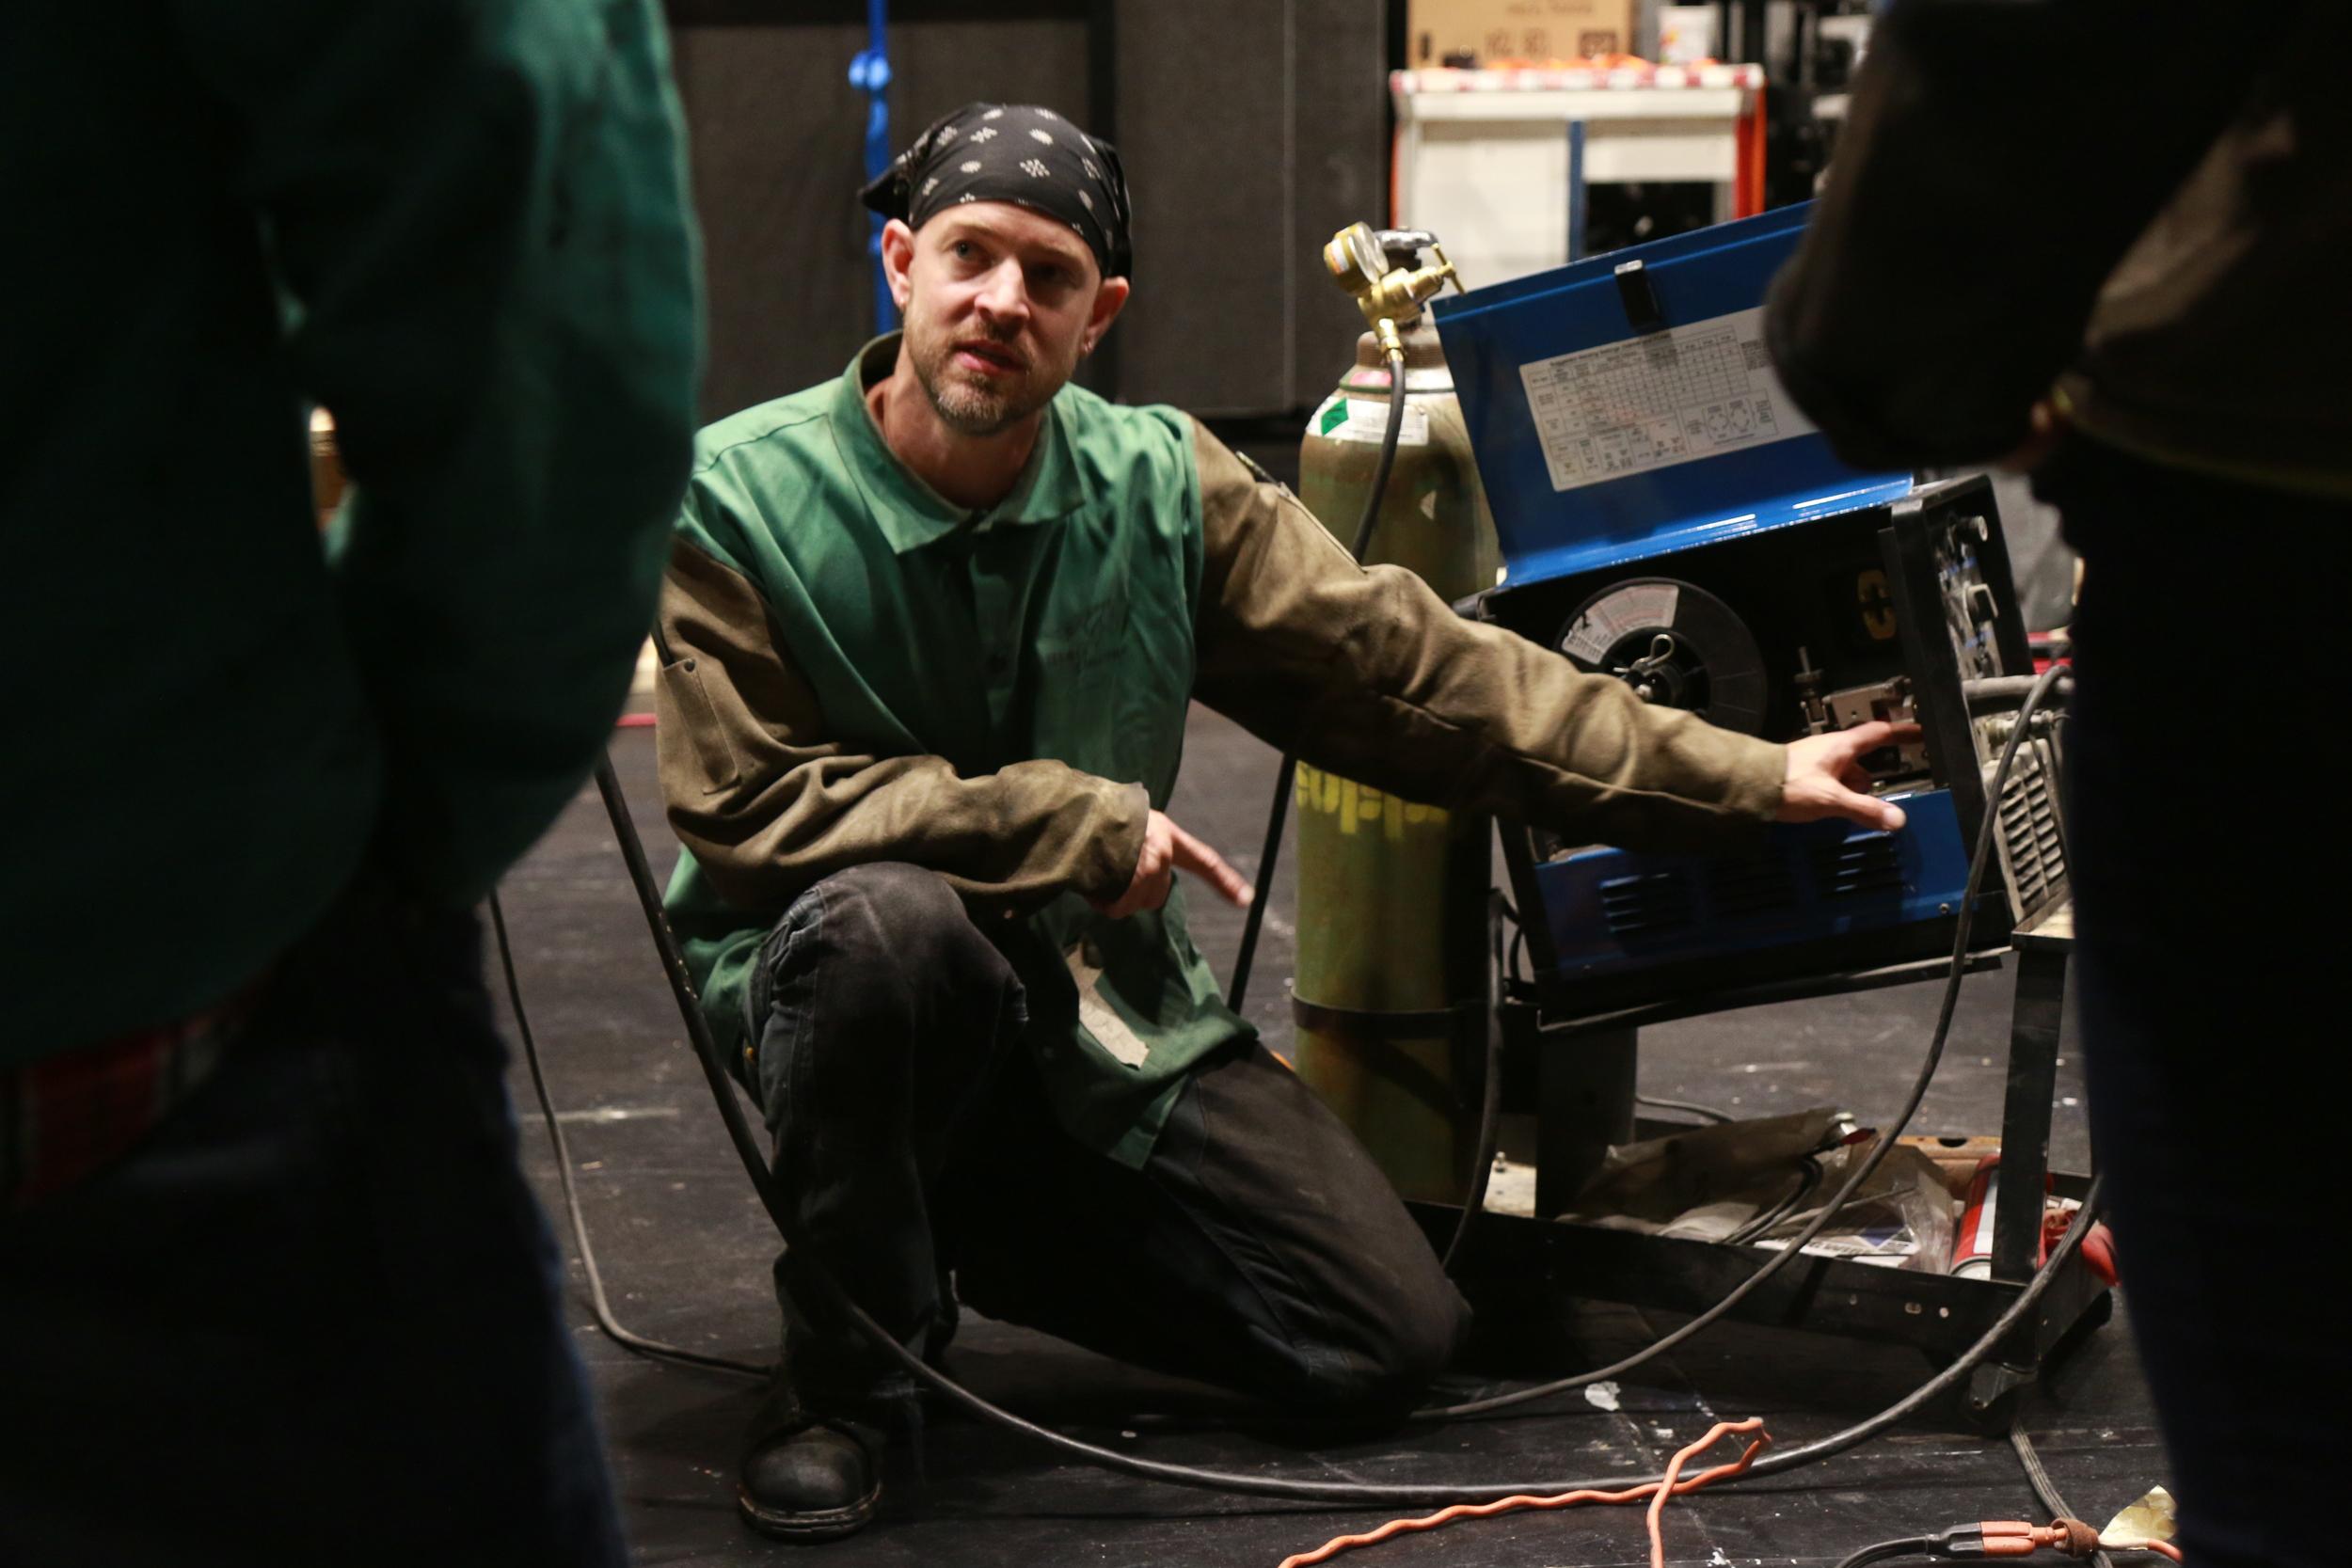 Guthrie Lead Carpenter Nate Saul explains the guts of a welder.